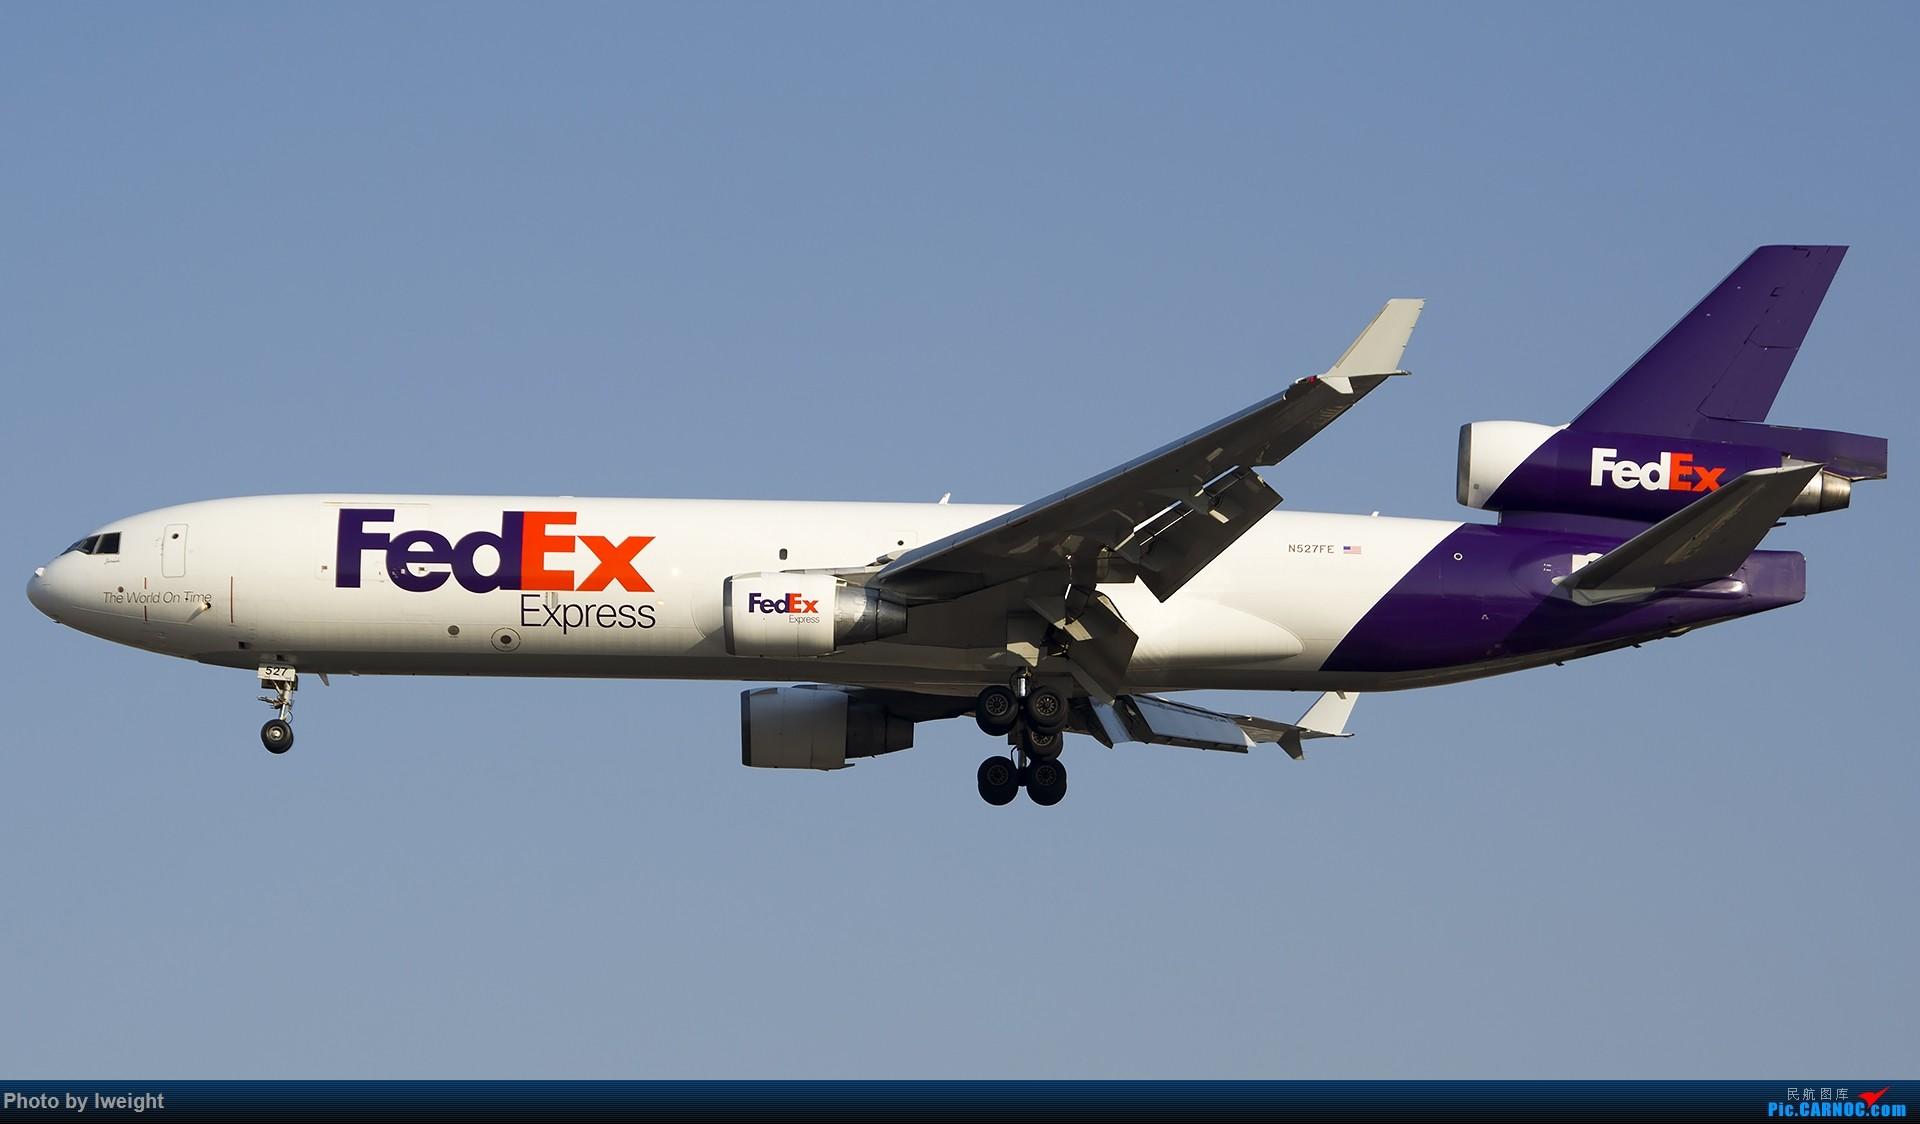 Re:[原创]2014-12-02 ZBAA随拍 MD MD-11 N527FE 中国北京首都国际机场